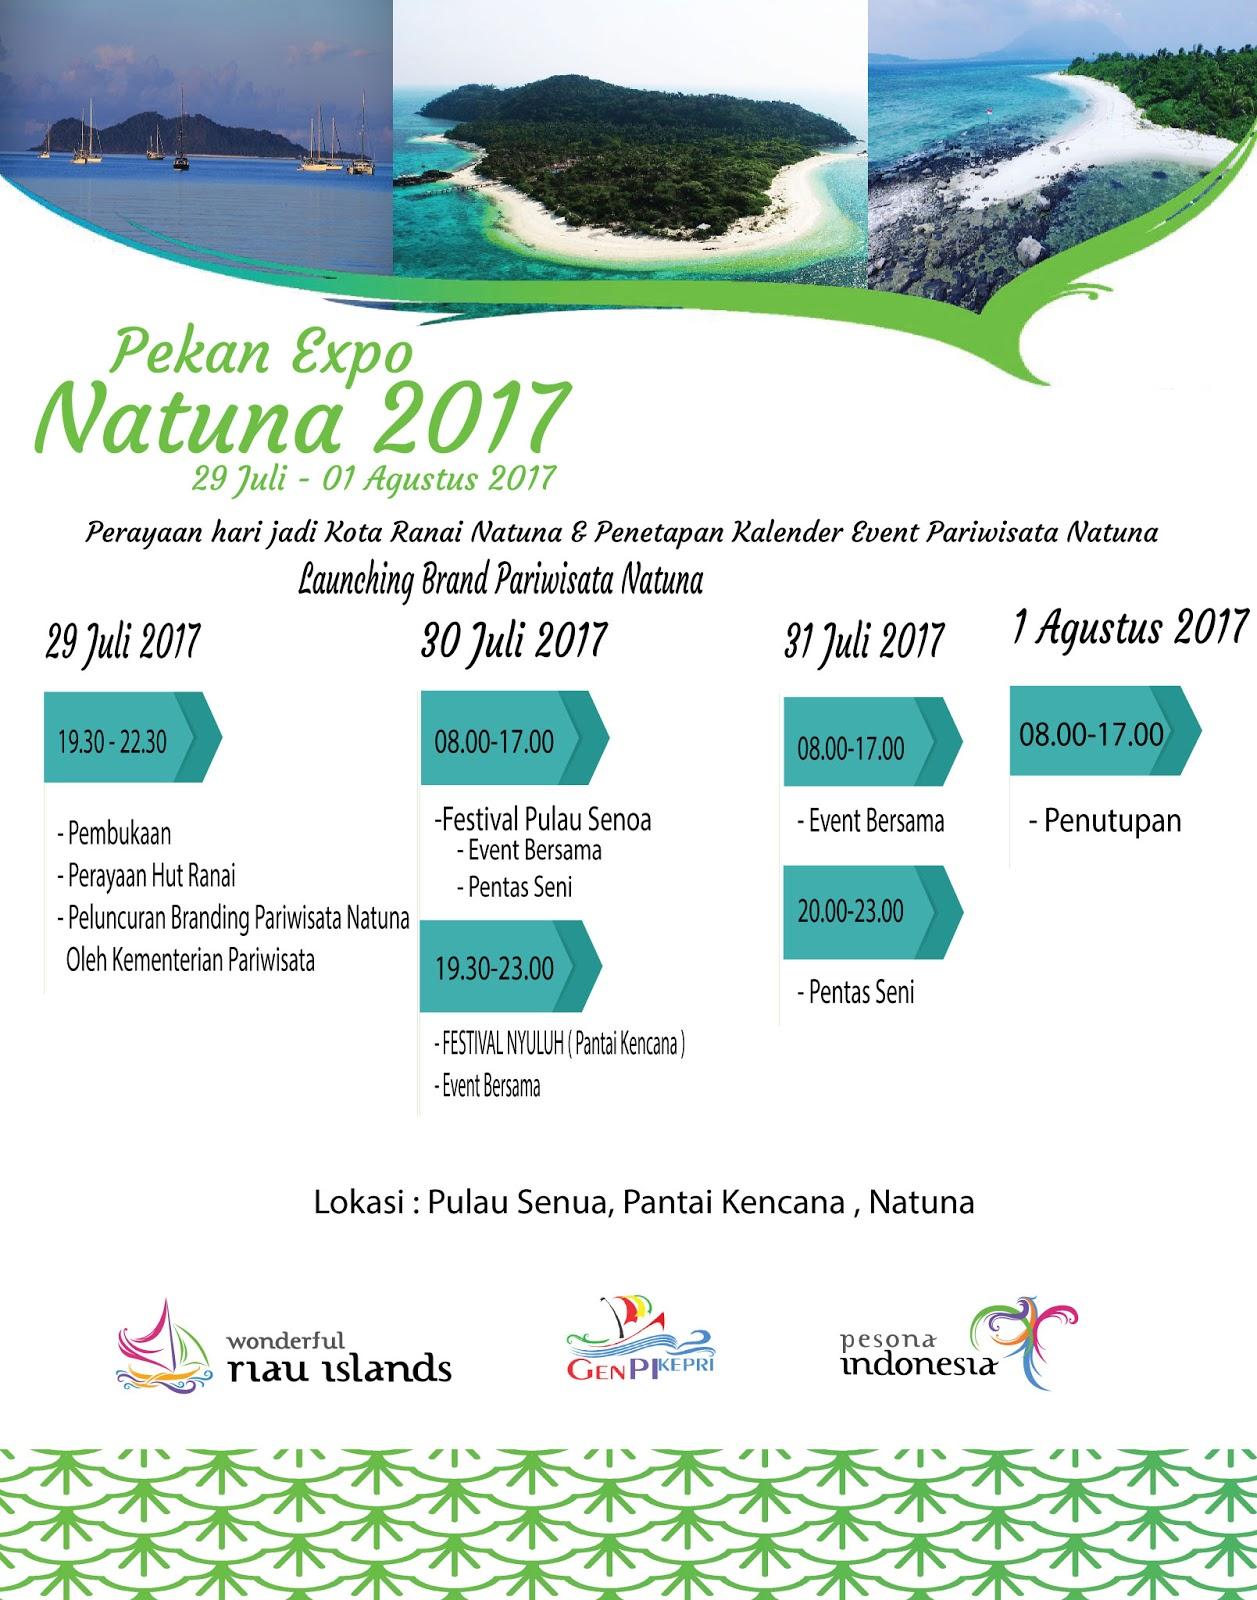 Pekan Expo Natuna 2017